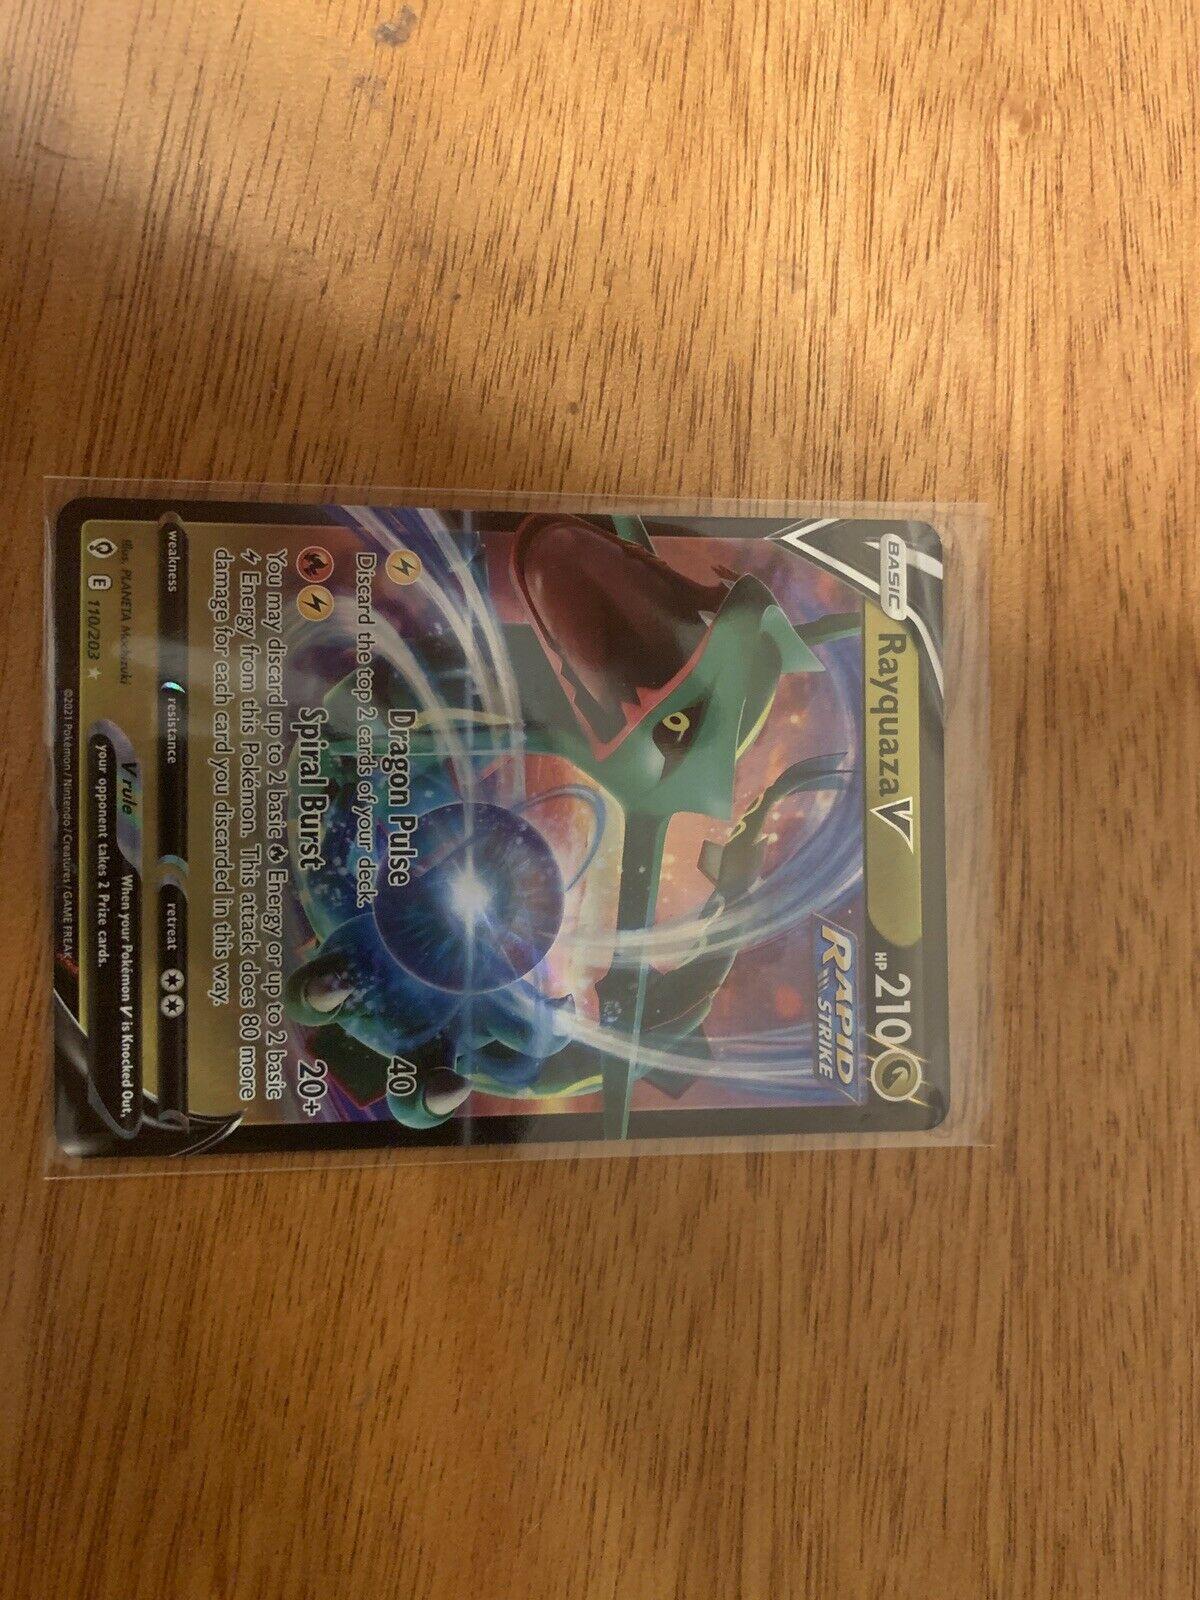 Rayquaza V 110/203 - Evolving Skies - Pokemon TCG Card - NM - Image 1